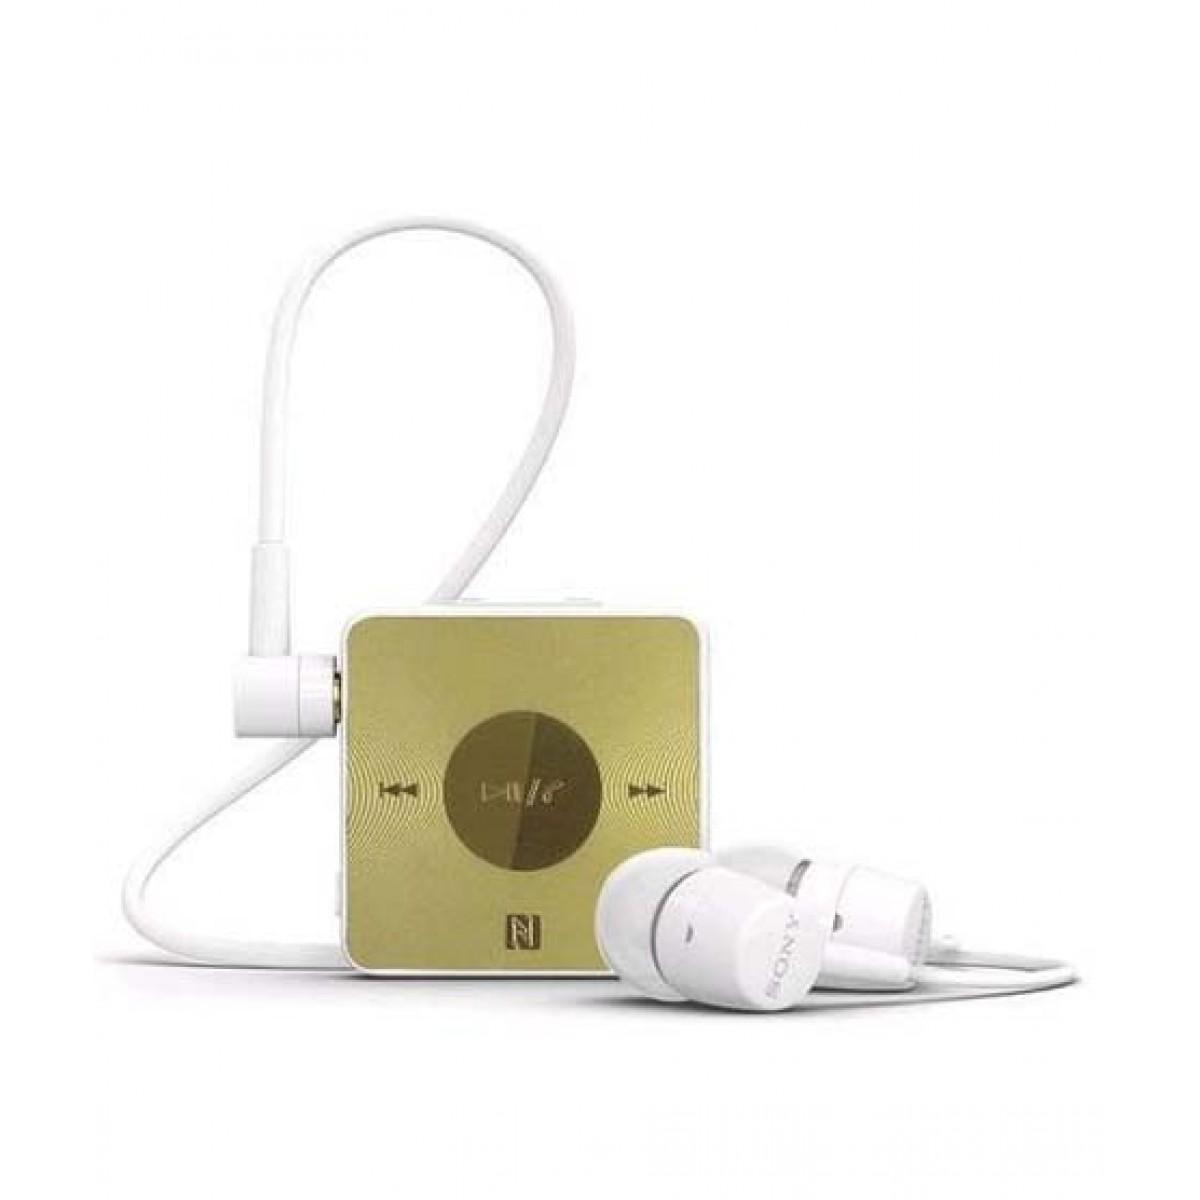 15cb793c918 Sony Stereo Bluetooth Headset Price in Pakistan | Buy Sony Stereo Bluetooth  Headset White Gold (SBH20) | iShopping.pk